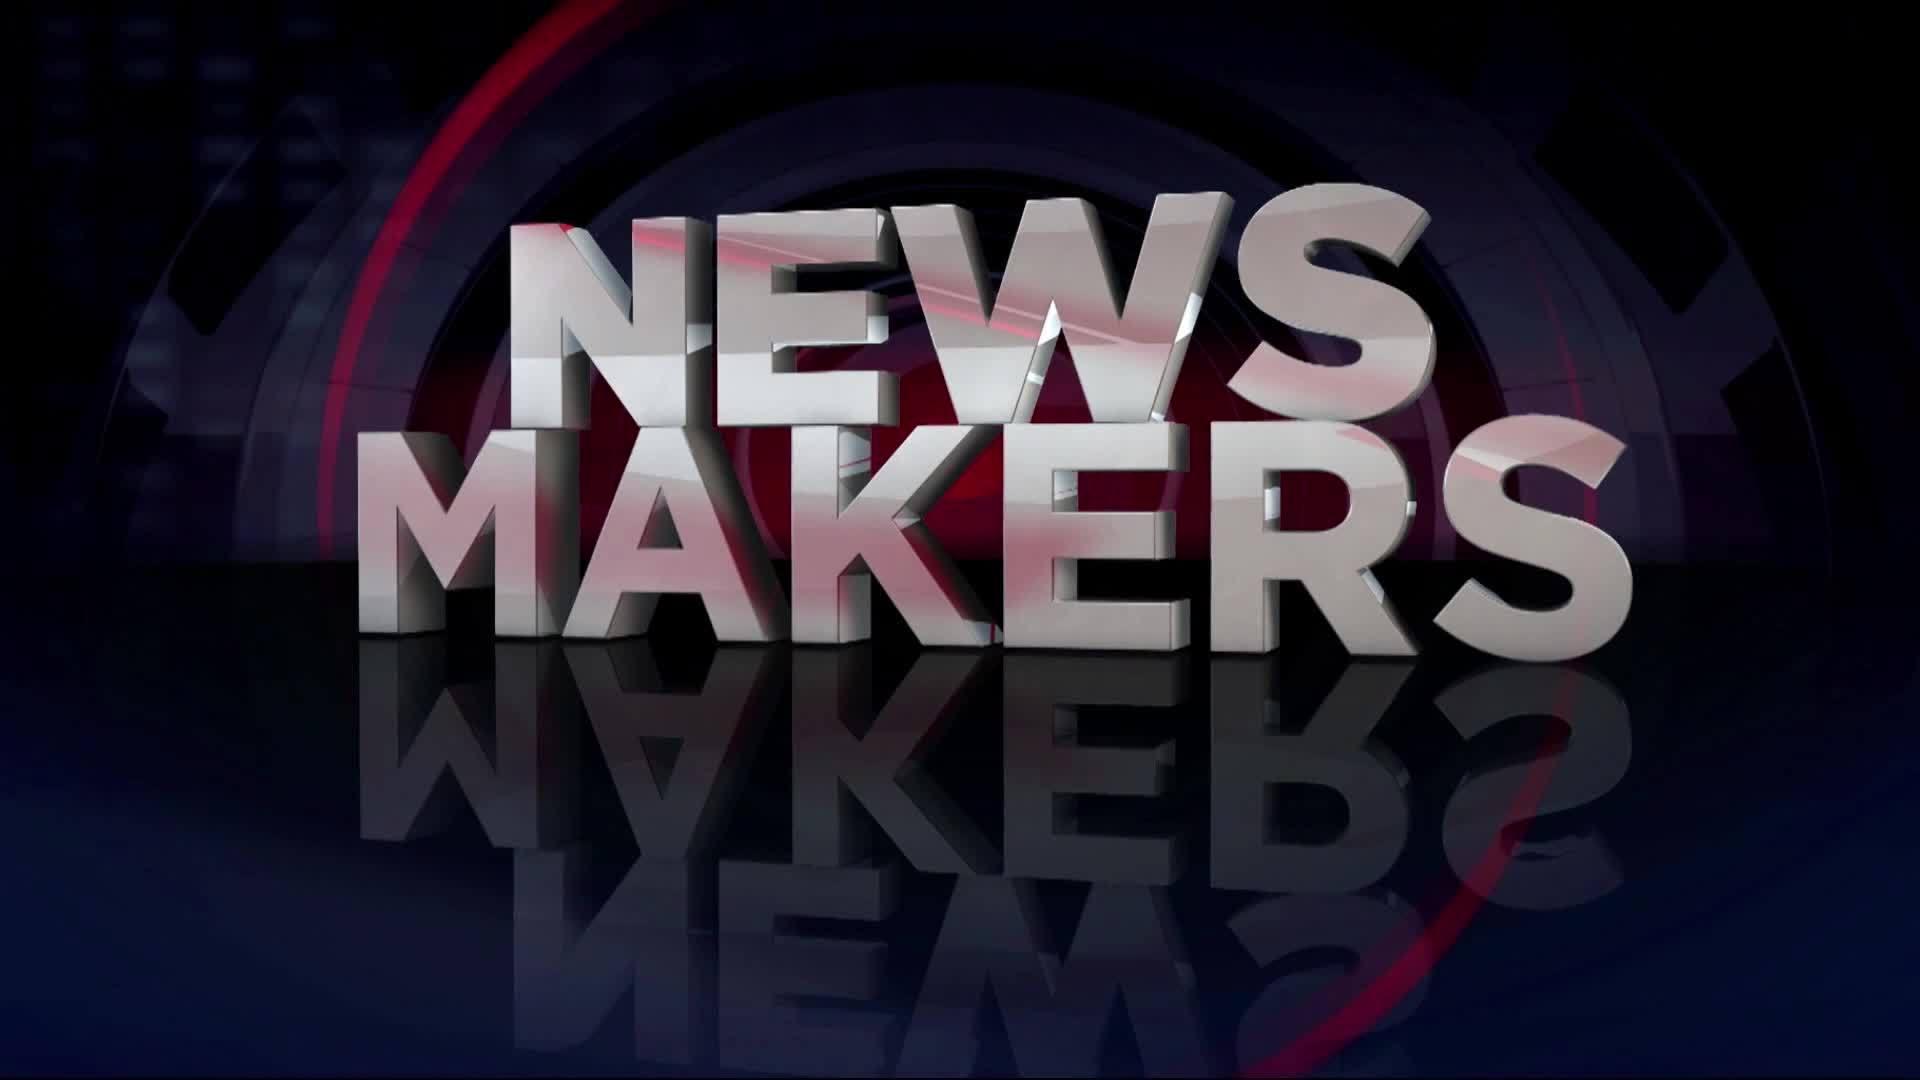 Newsmakers_CASA_January_2019_4_20190115170615